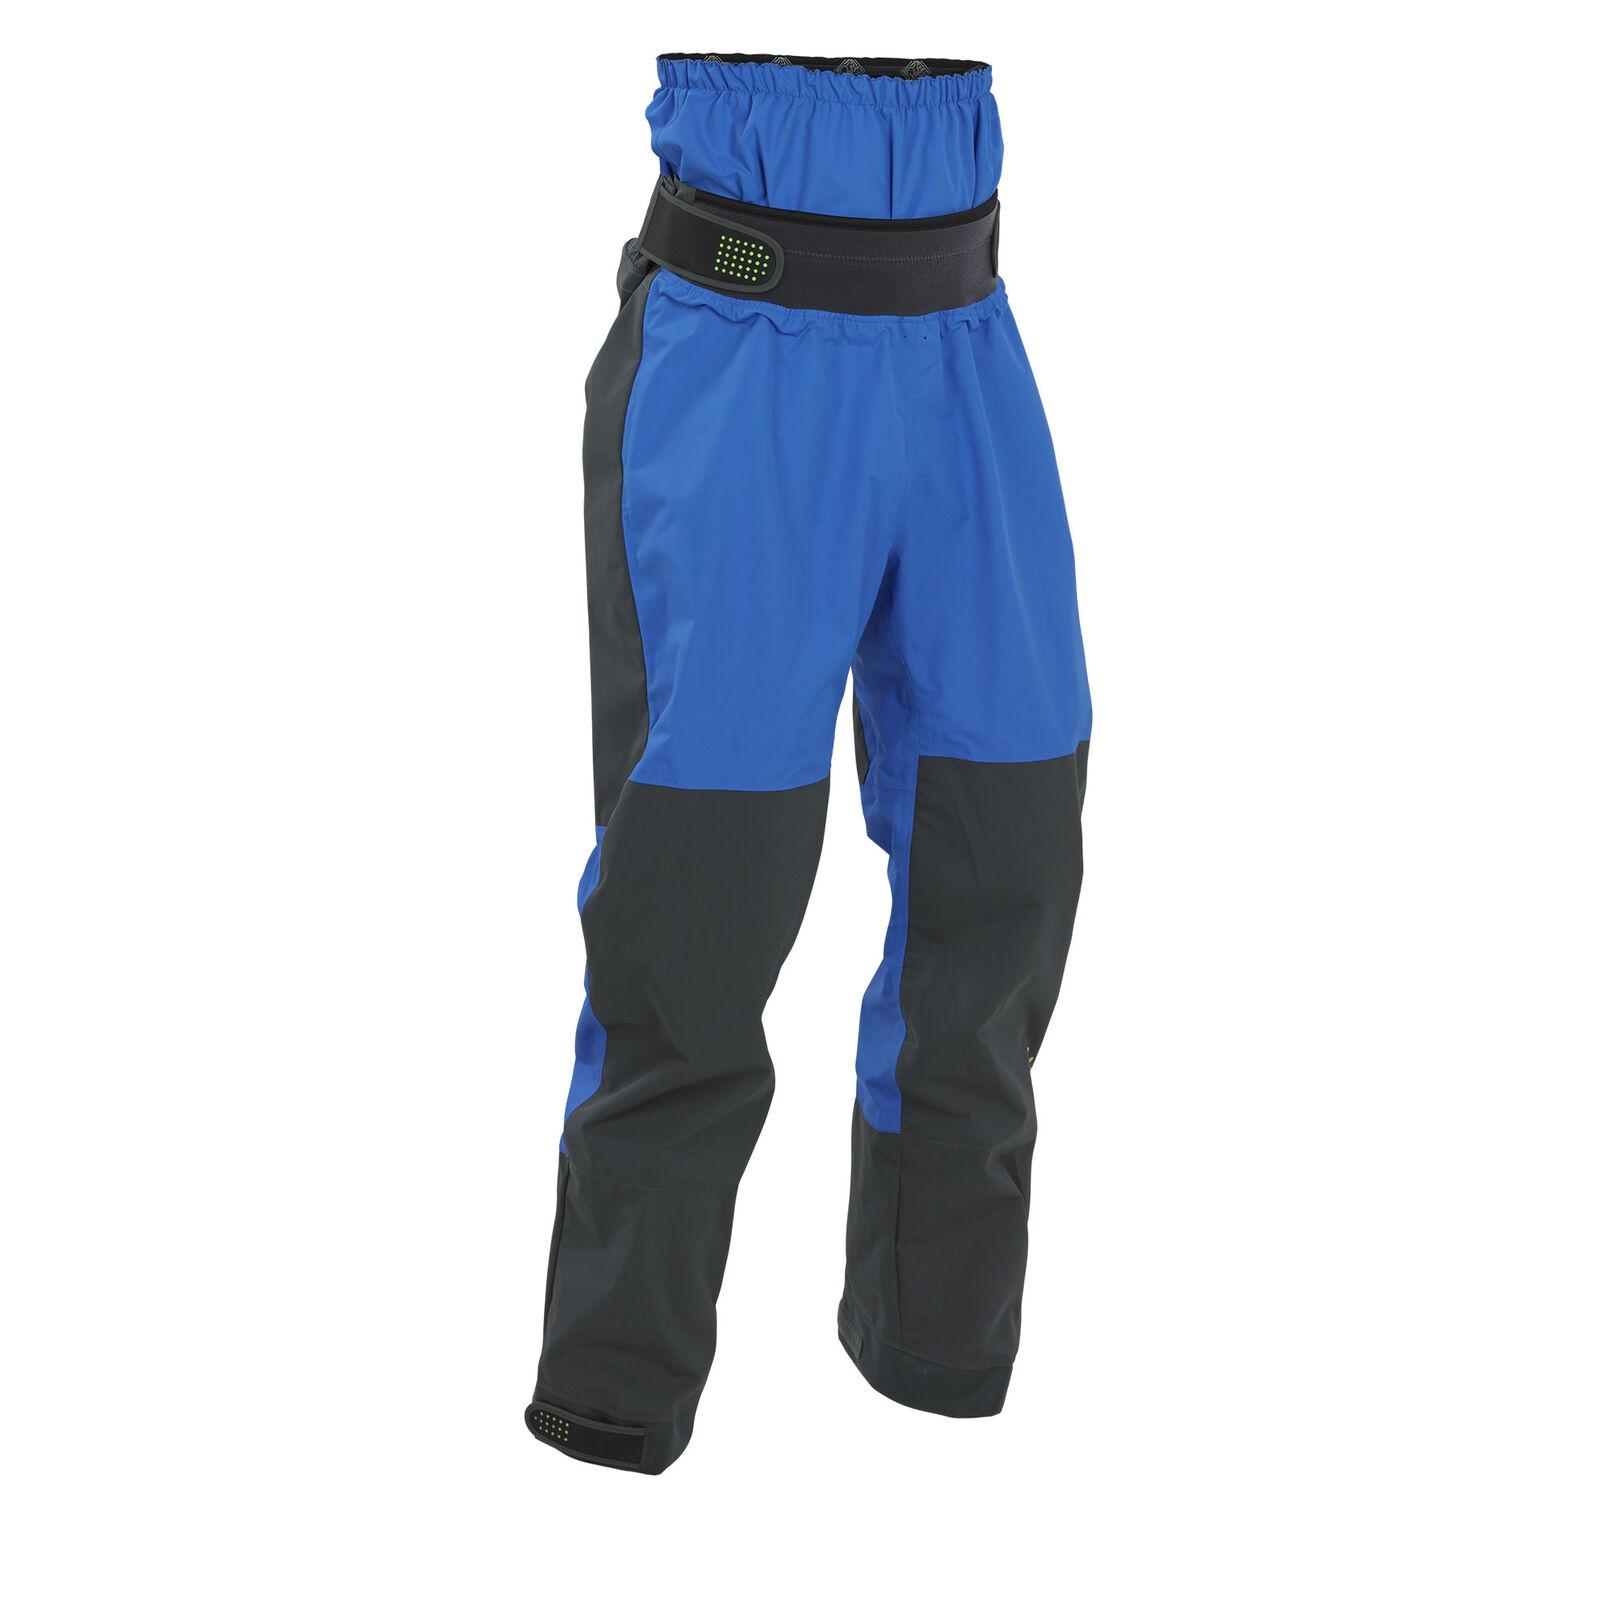 Palm Zenith Kayak Trousers 2019 - blueee